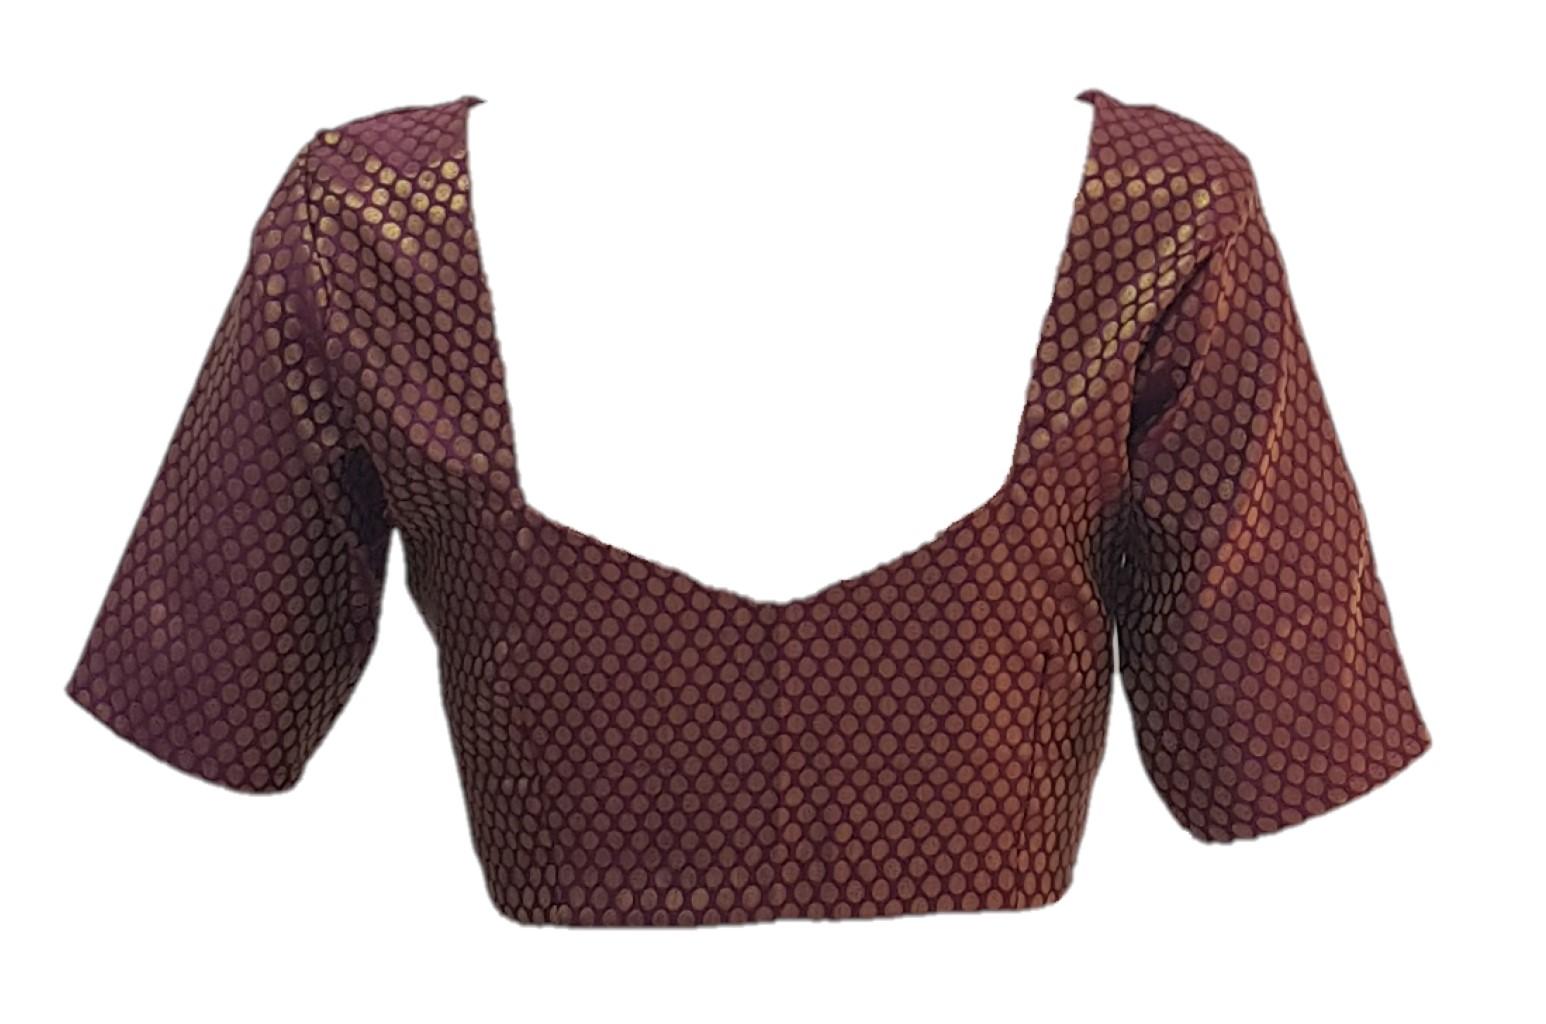 Art Silk Fabric Jari Work Readymade Saree Blouse Deep Purple Size Medium : Picture